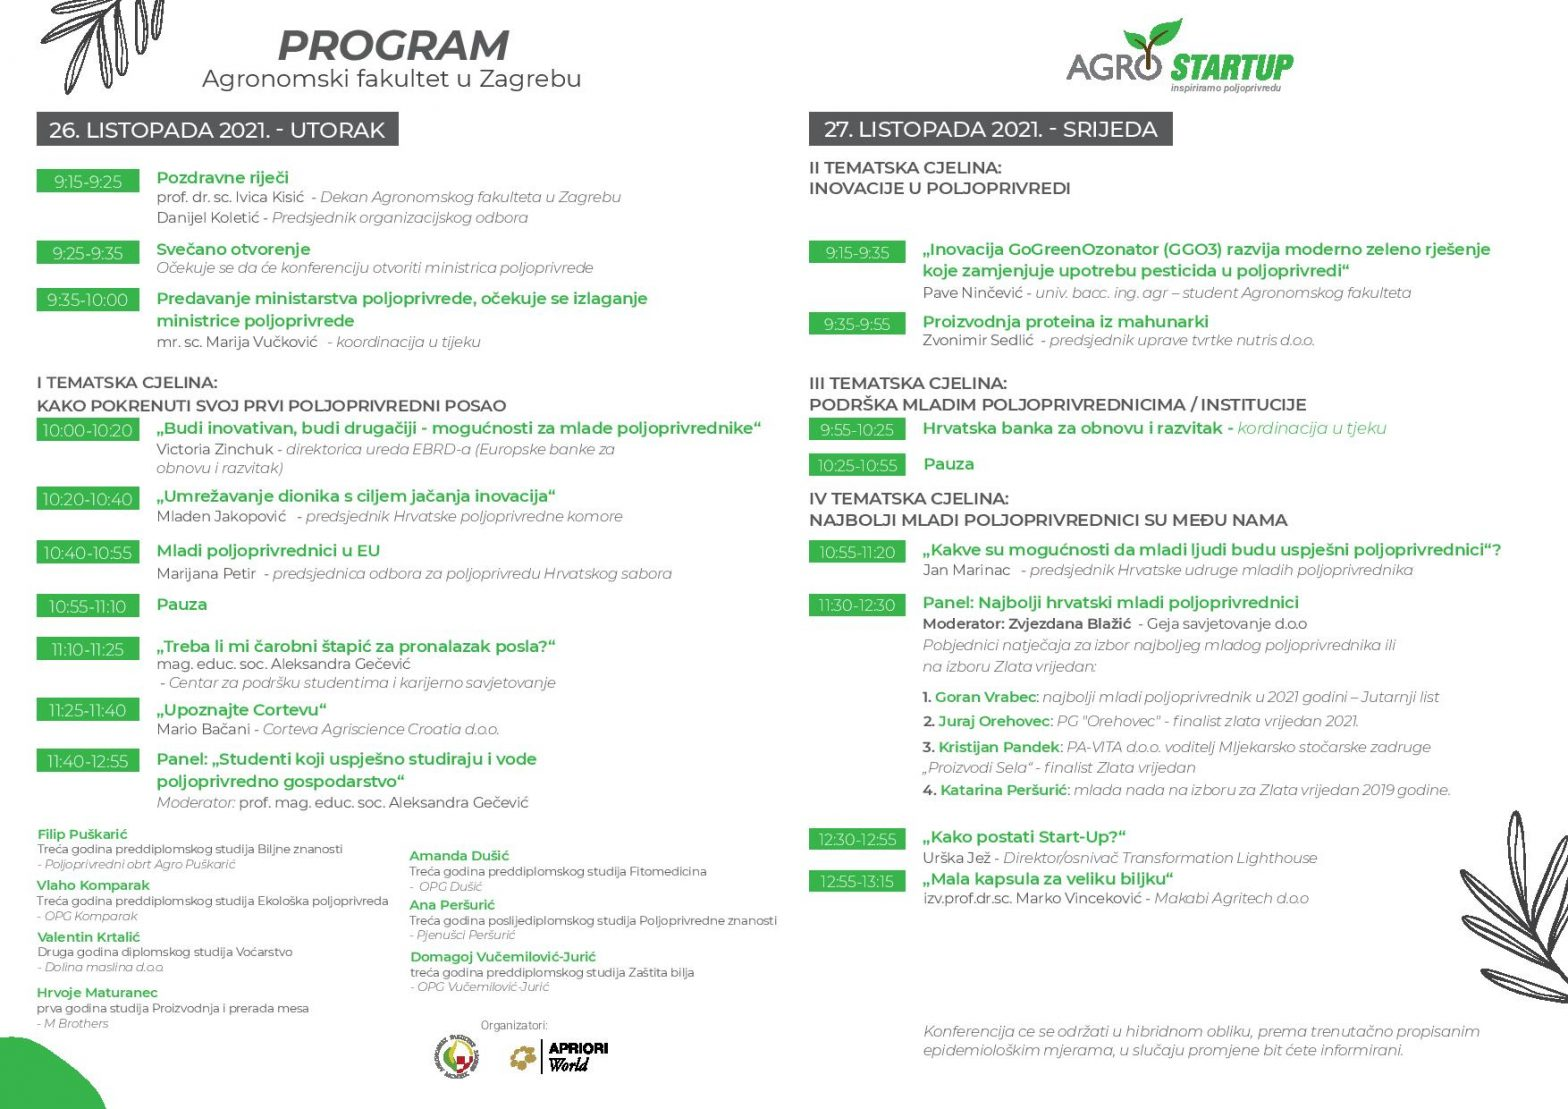 Agro Start-Up konferencija – 26. i 27. listopada u Zagrebu